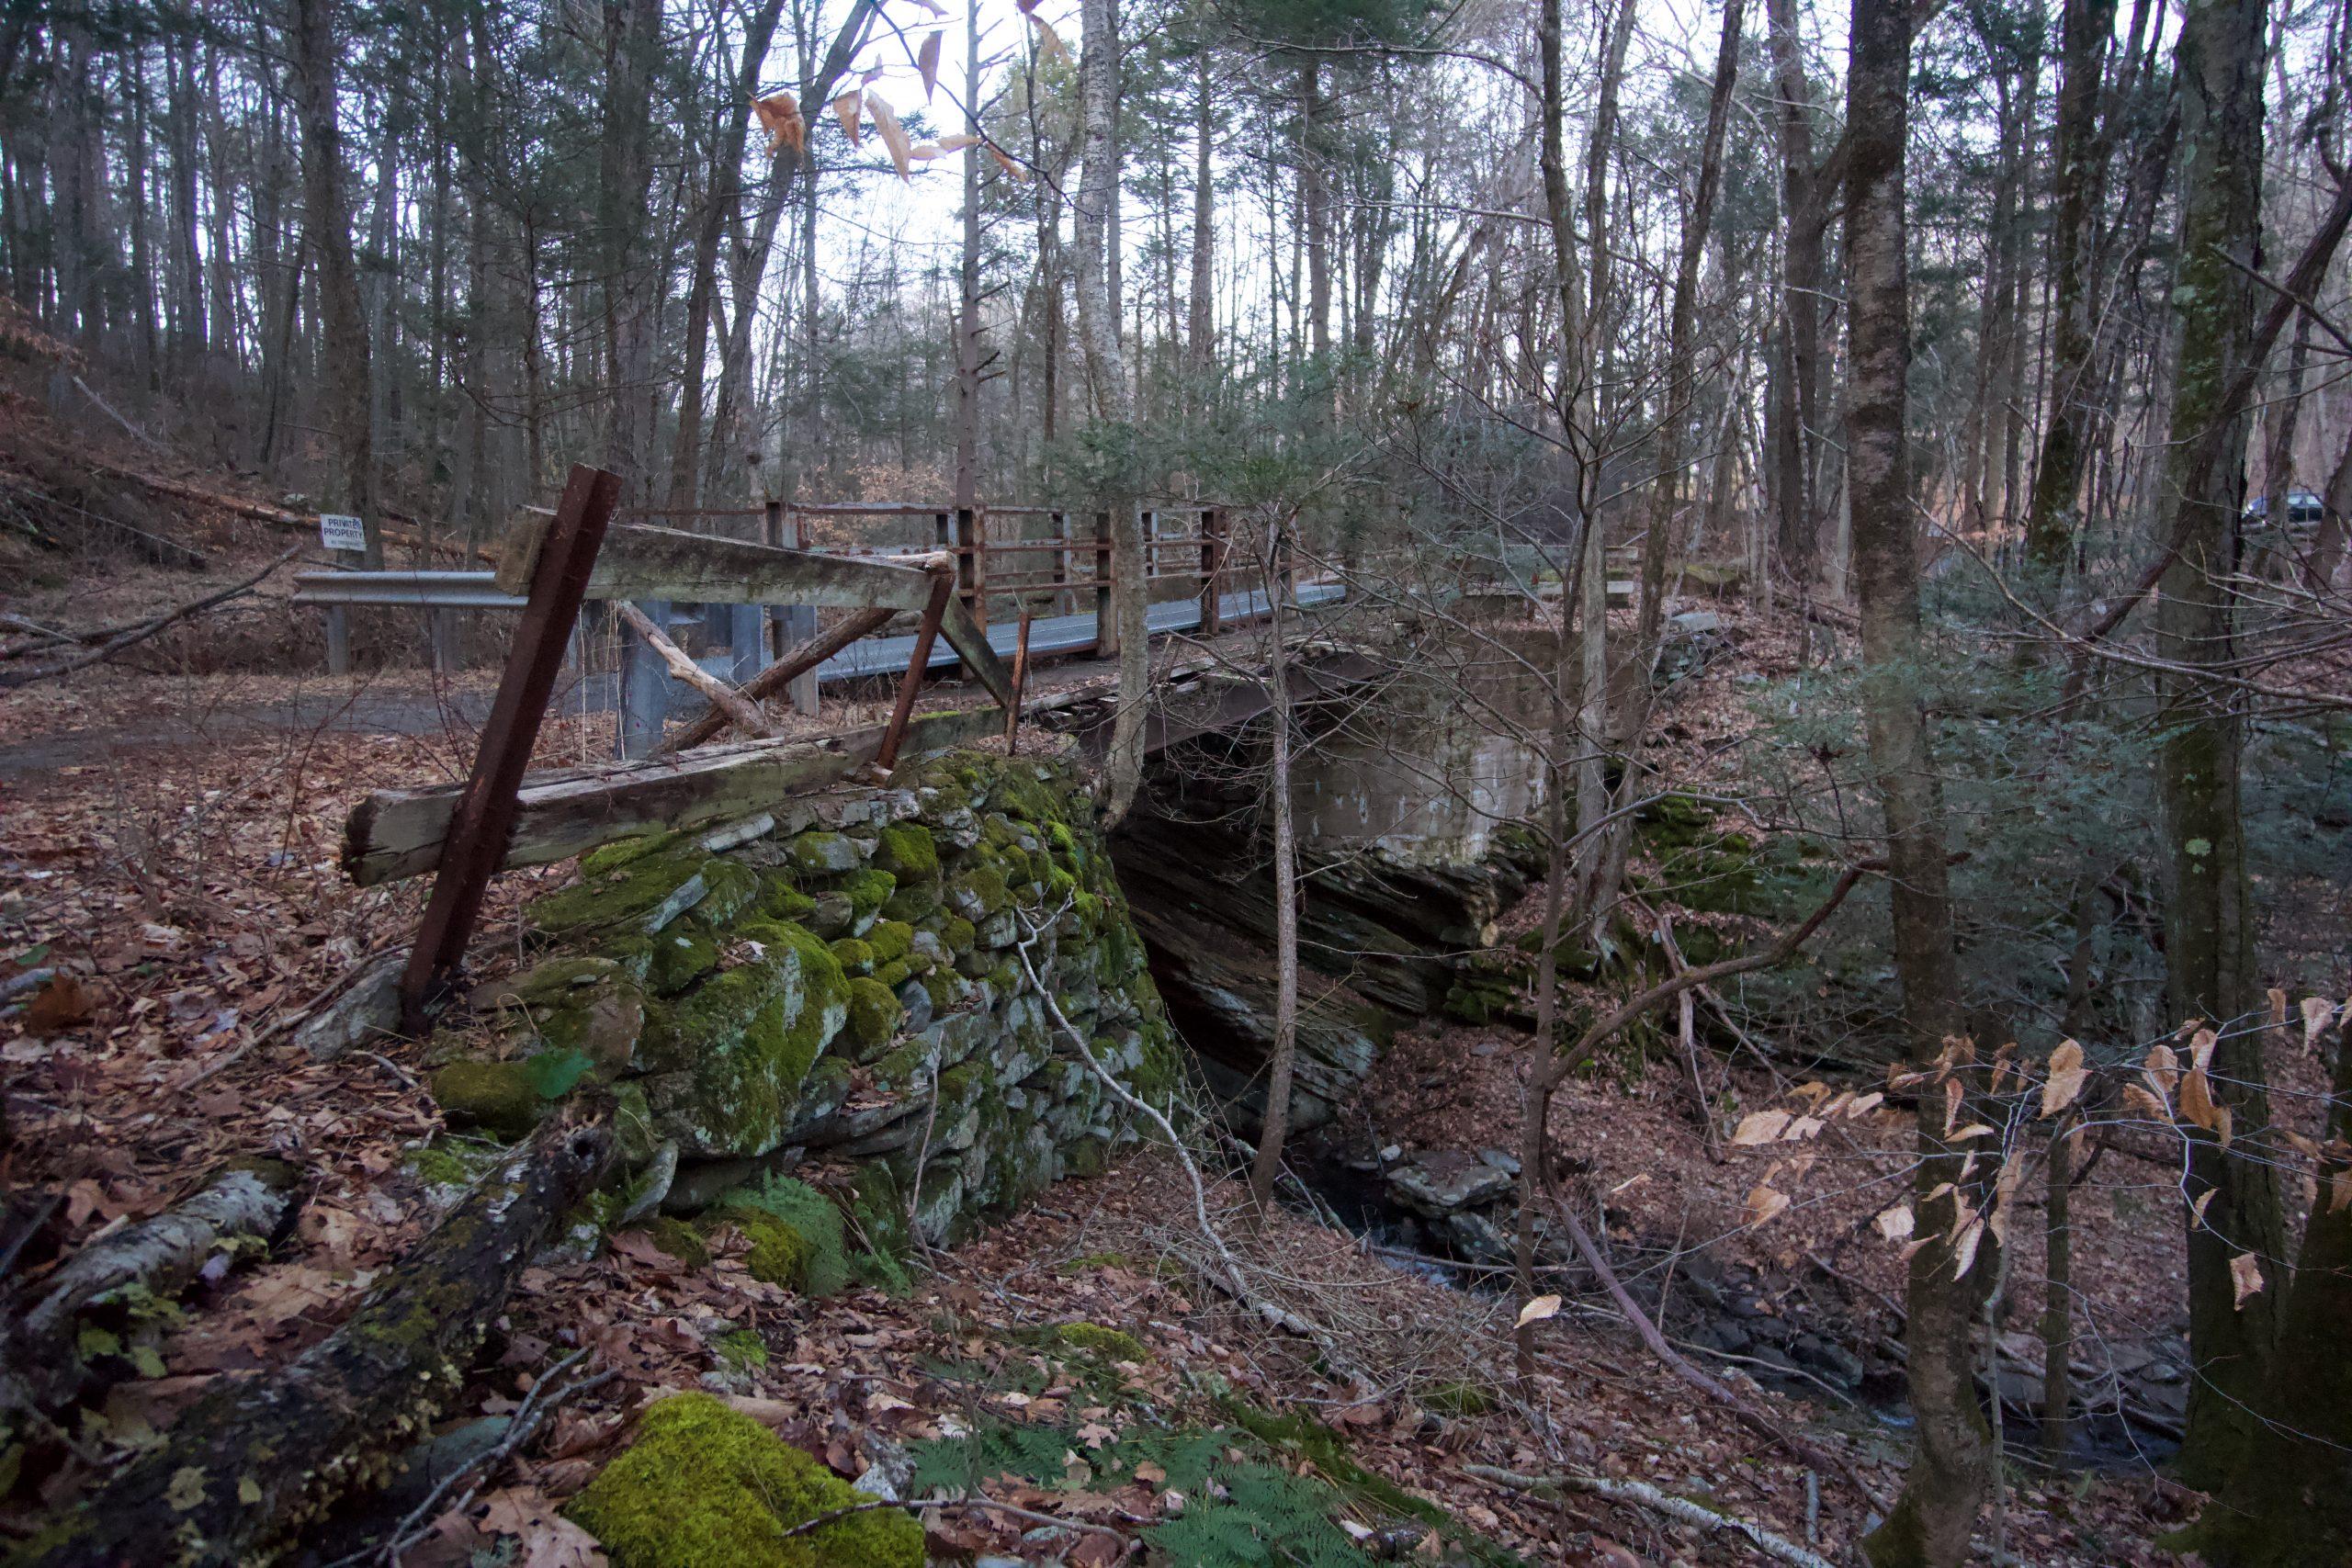 George Dudley Seymour Bridge